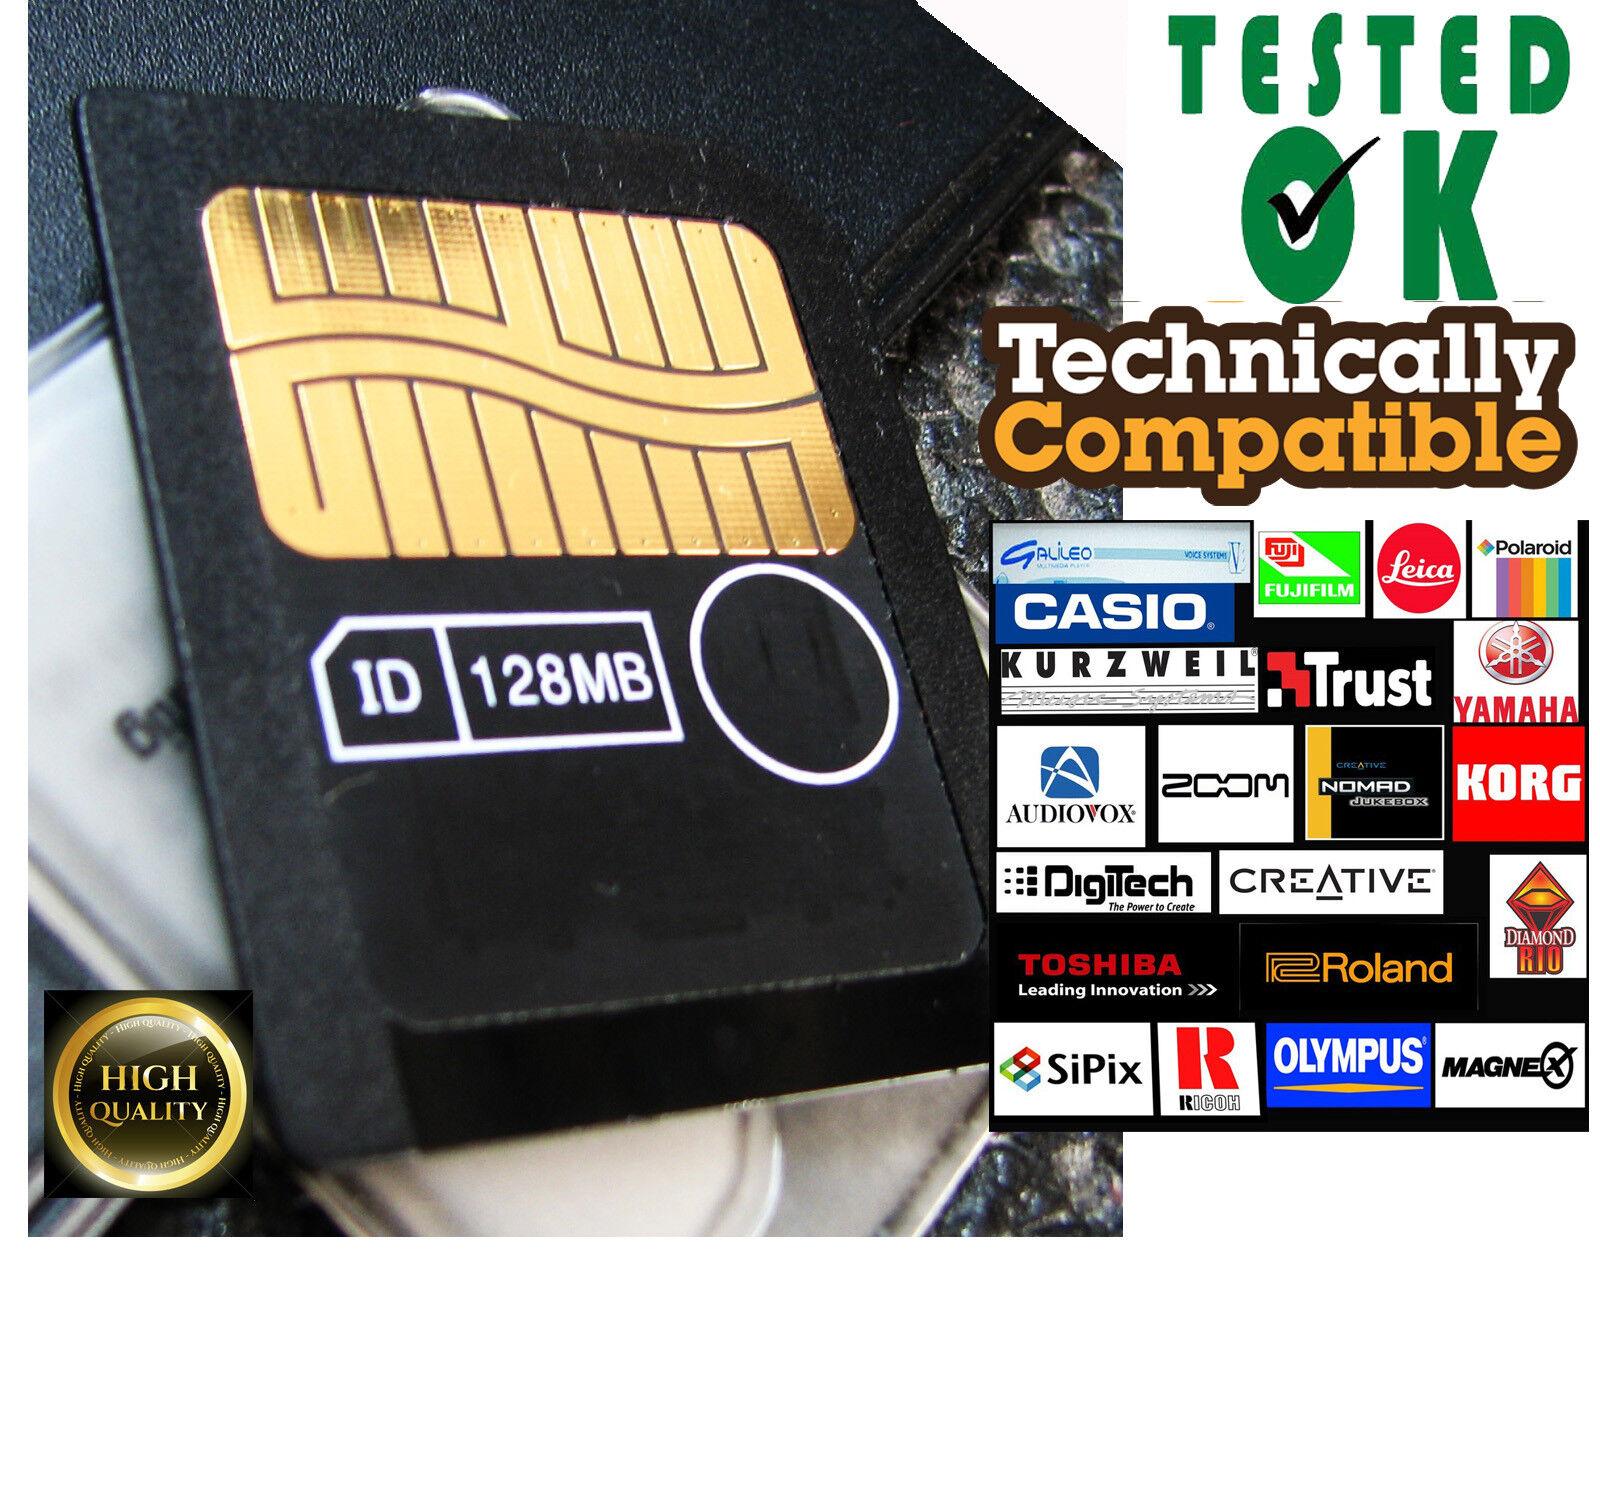 128MB SMARTMEDIA CARD-Memoria Musicale Tastiere Campionatori KORG Yamaha TESTED